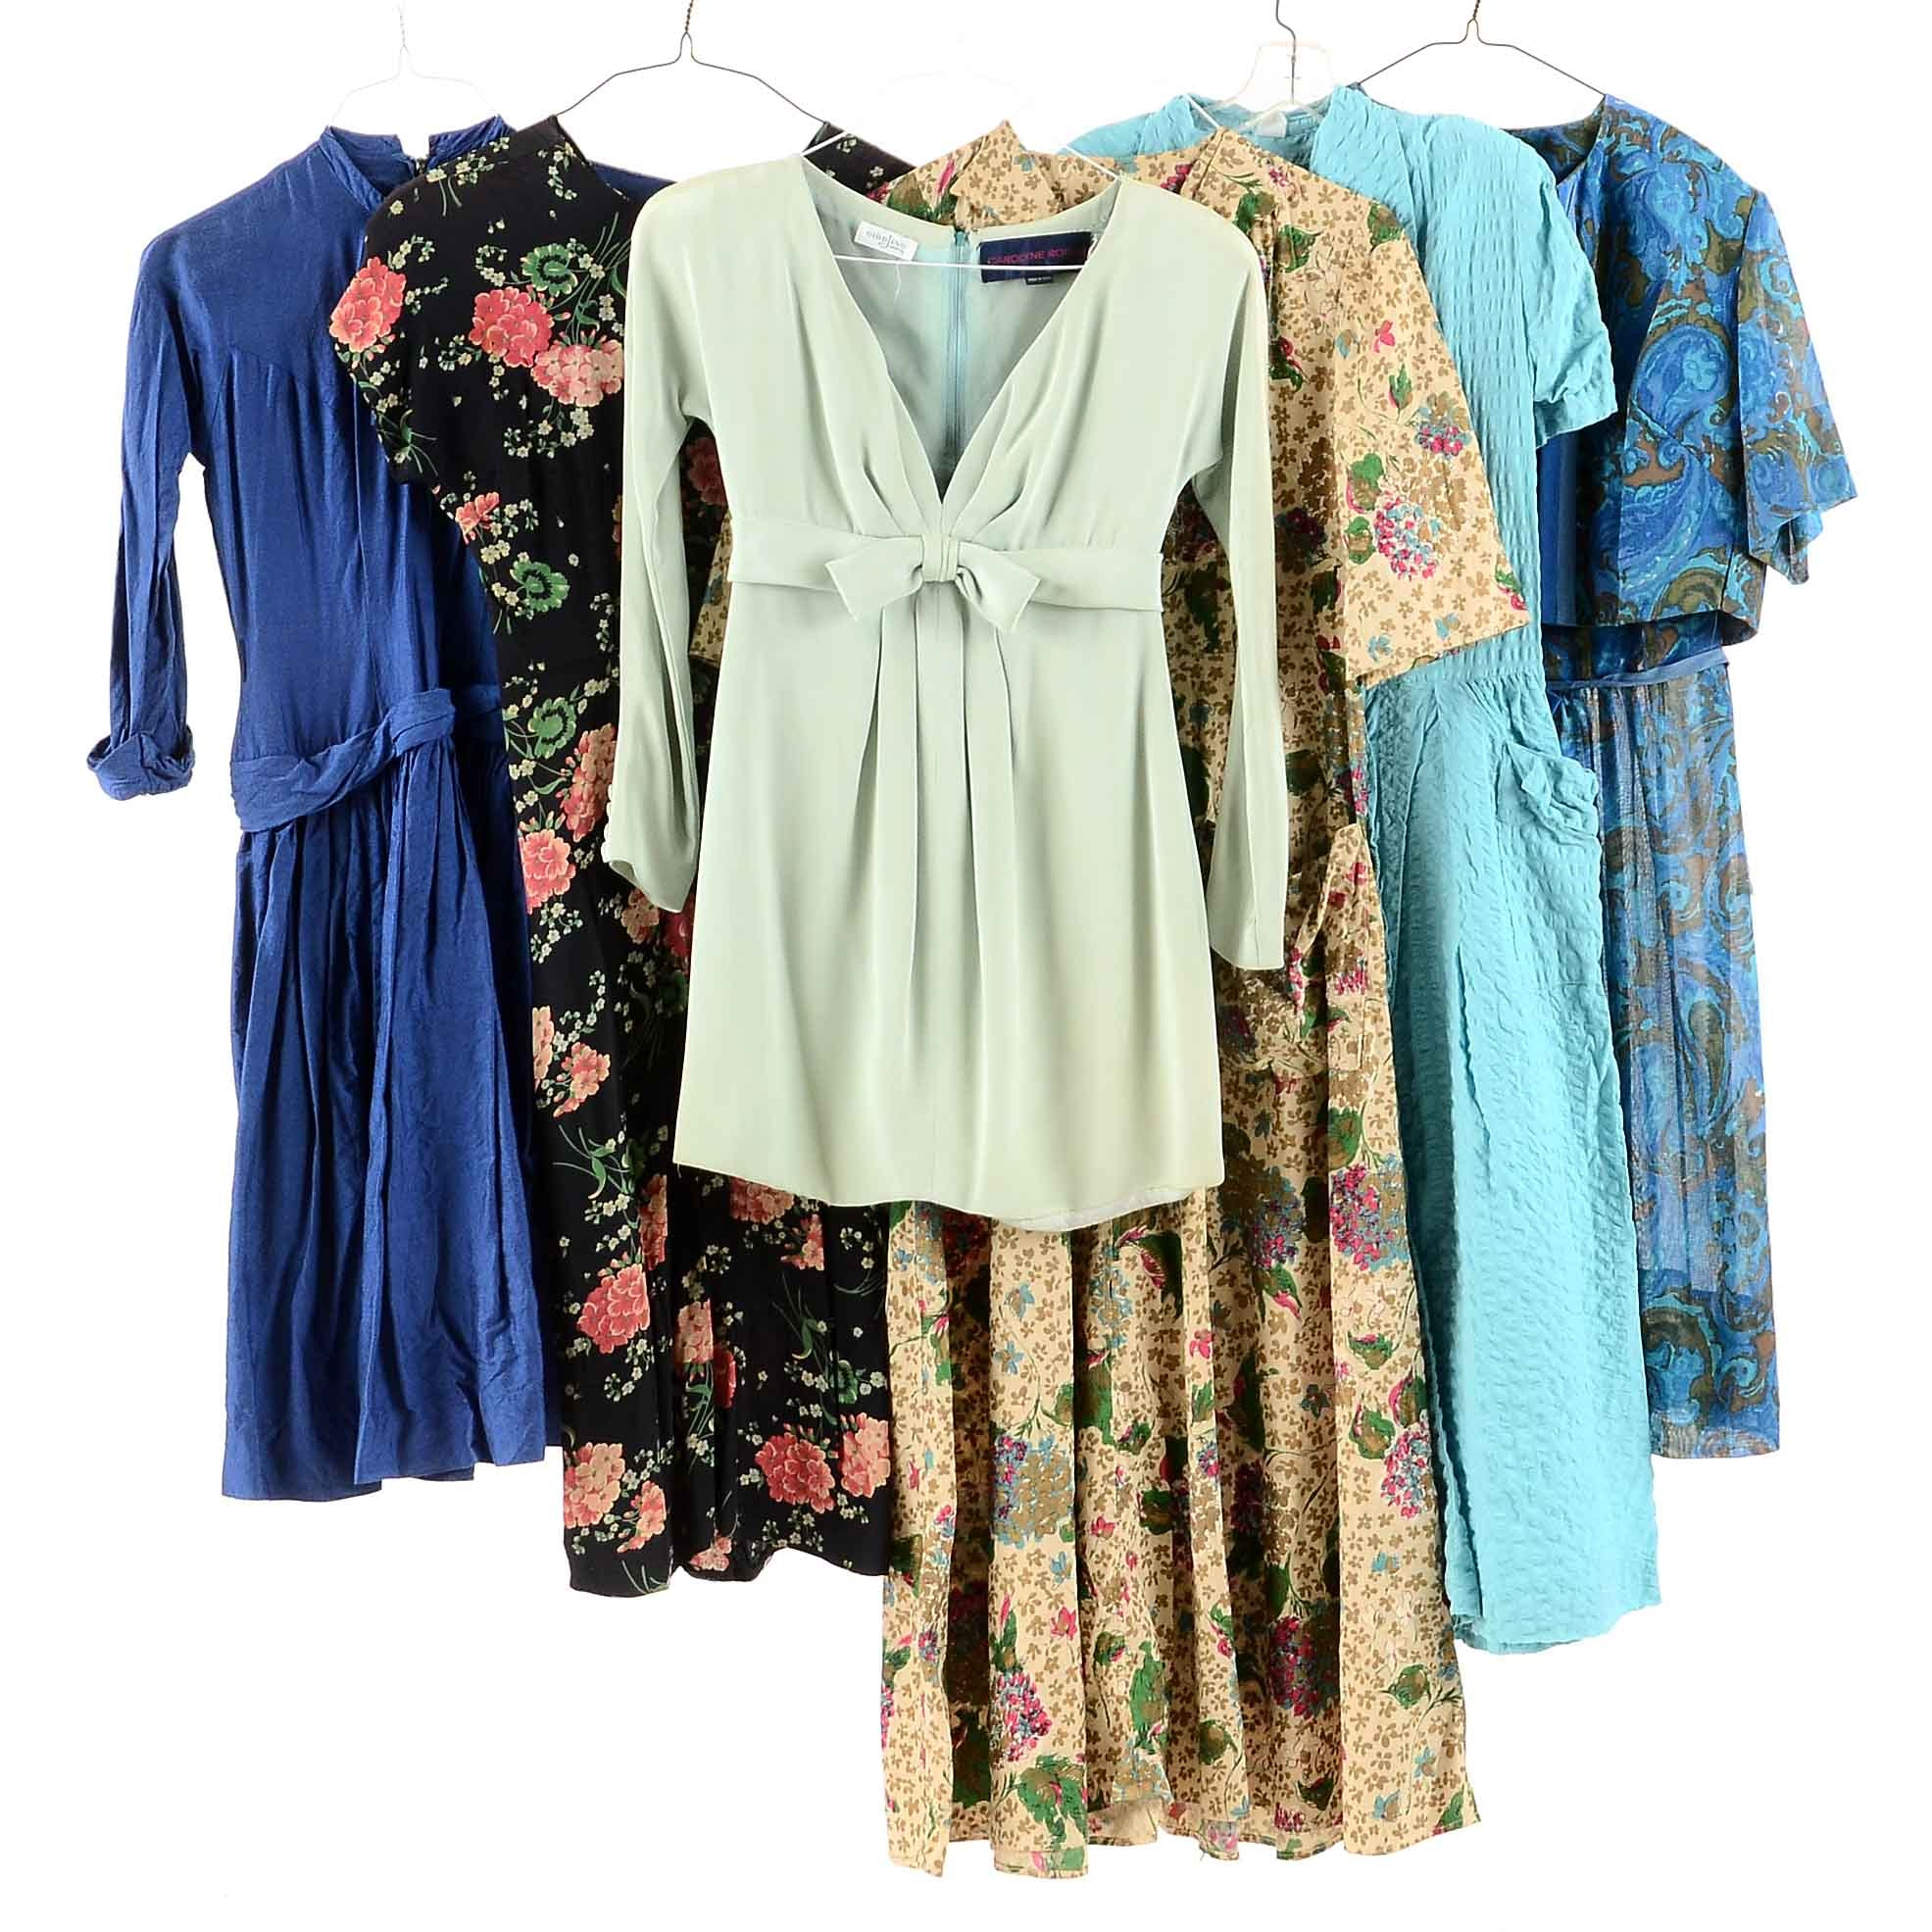 Women's Vintage Day Dresses